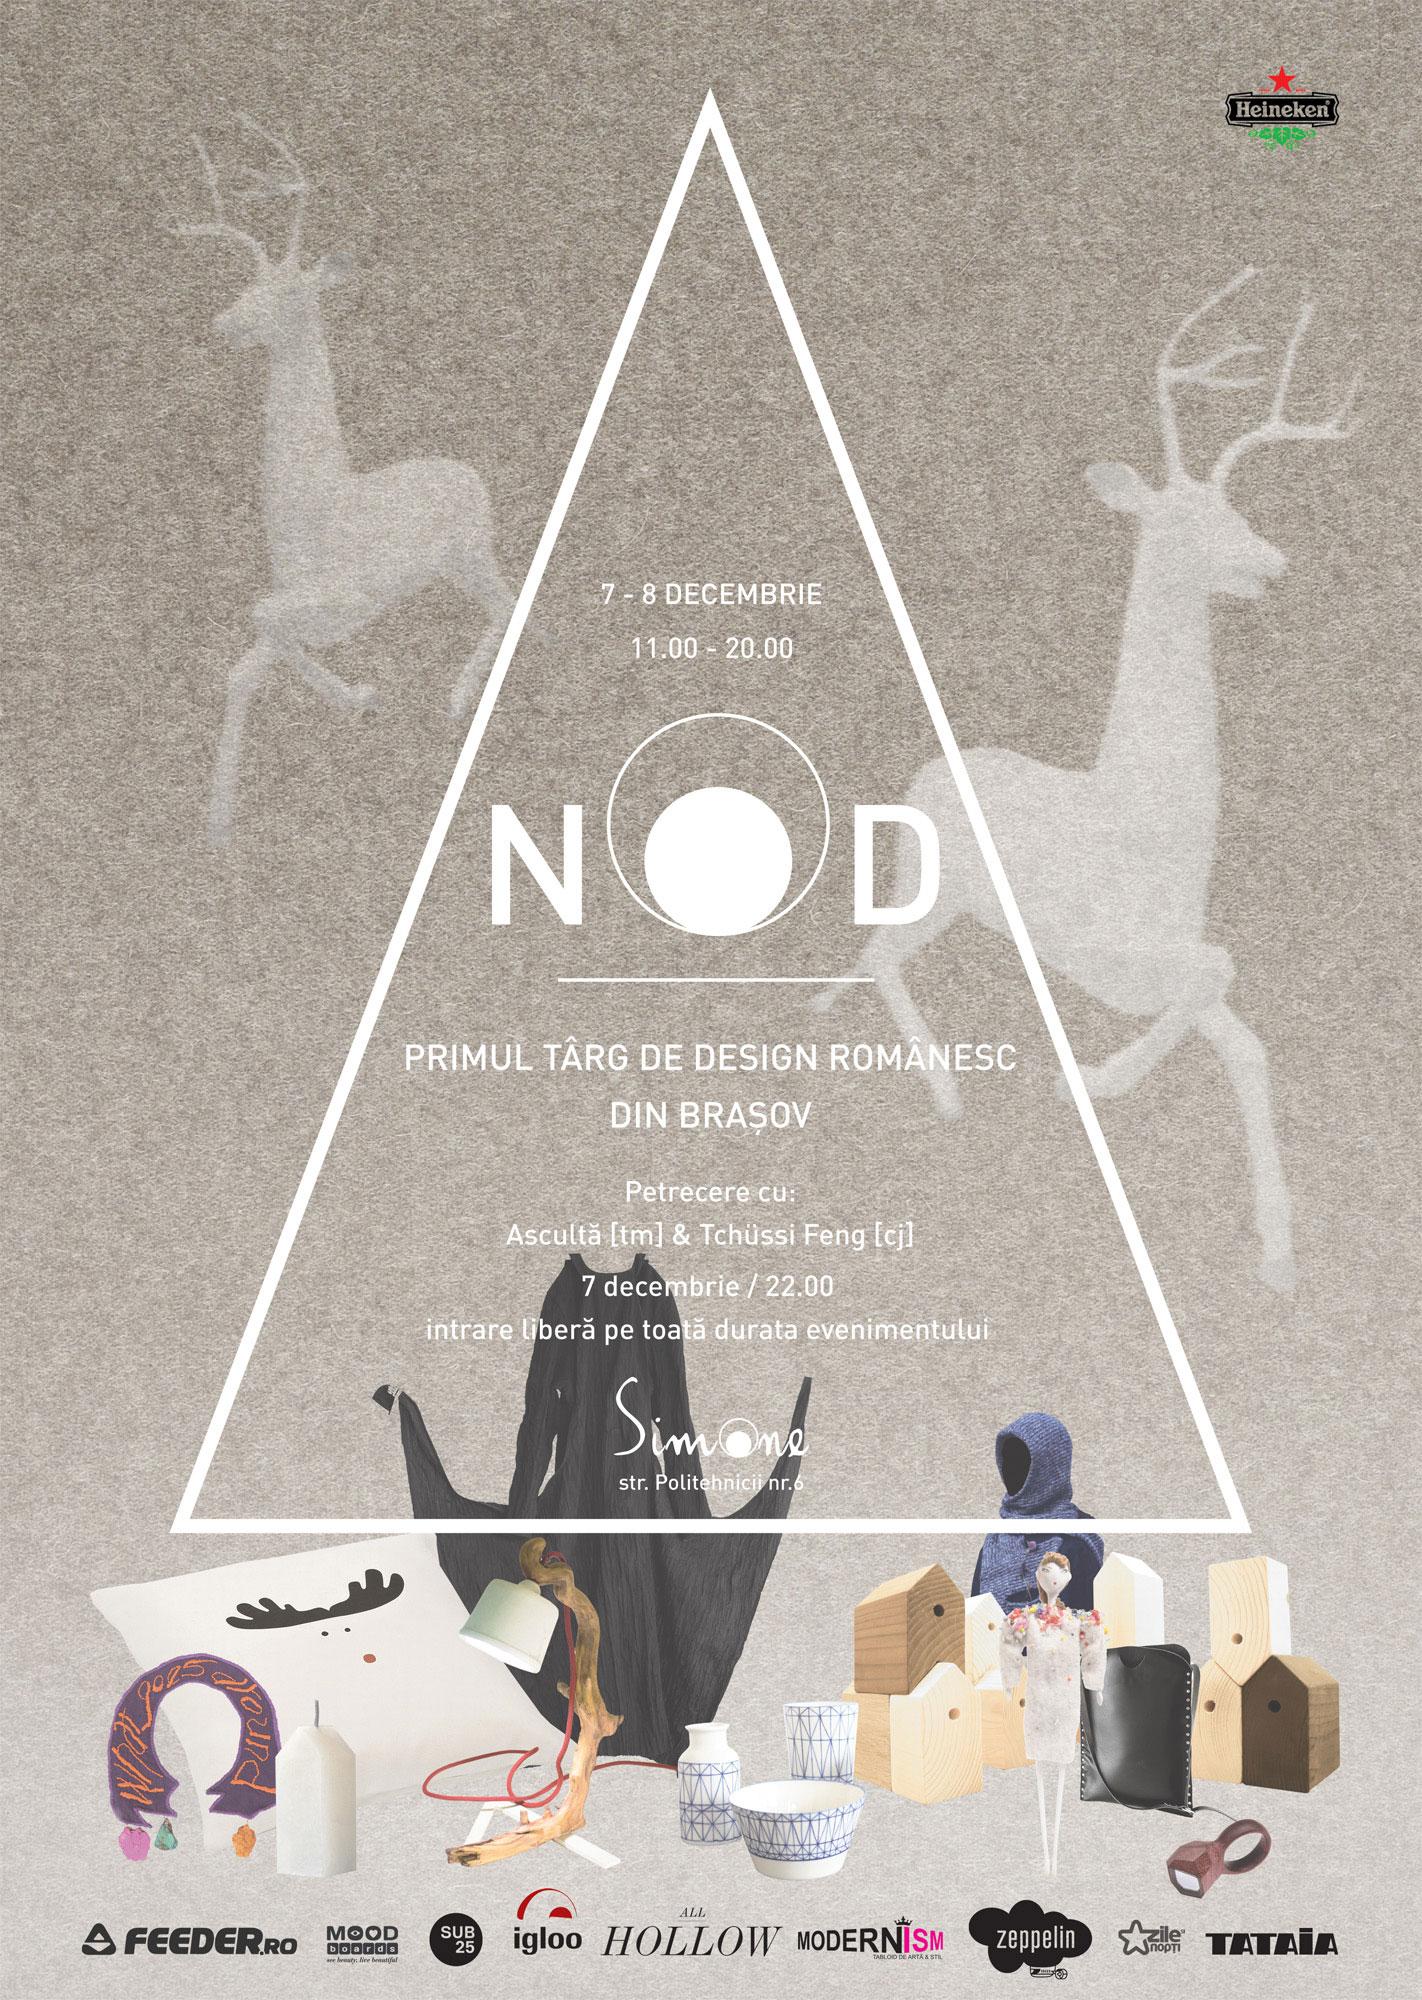 NOD – Primul târg de design românesc la Braşov